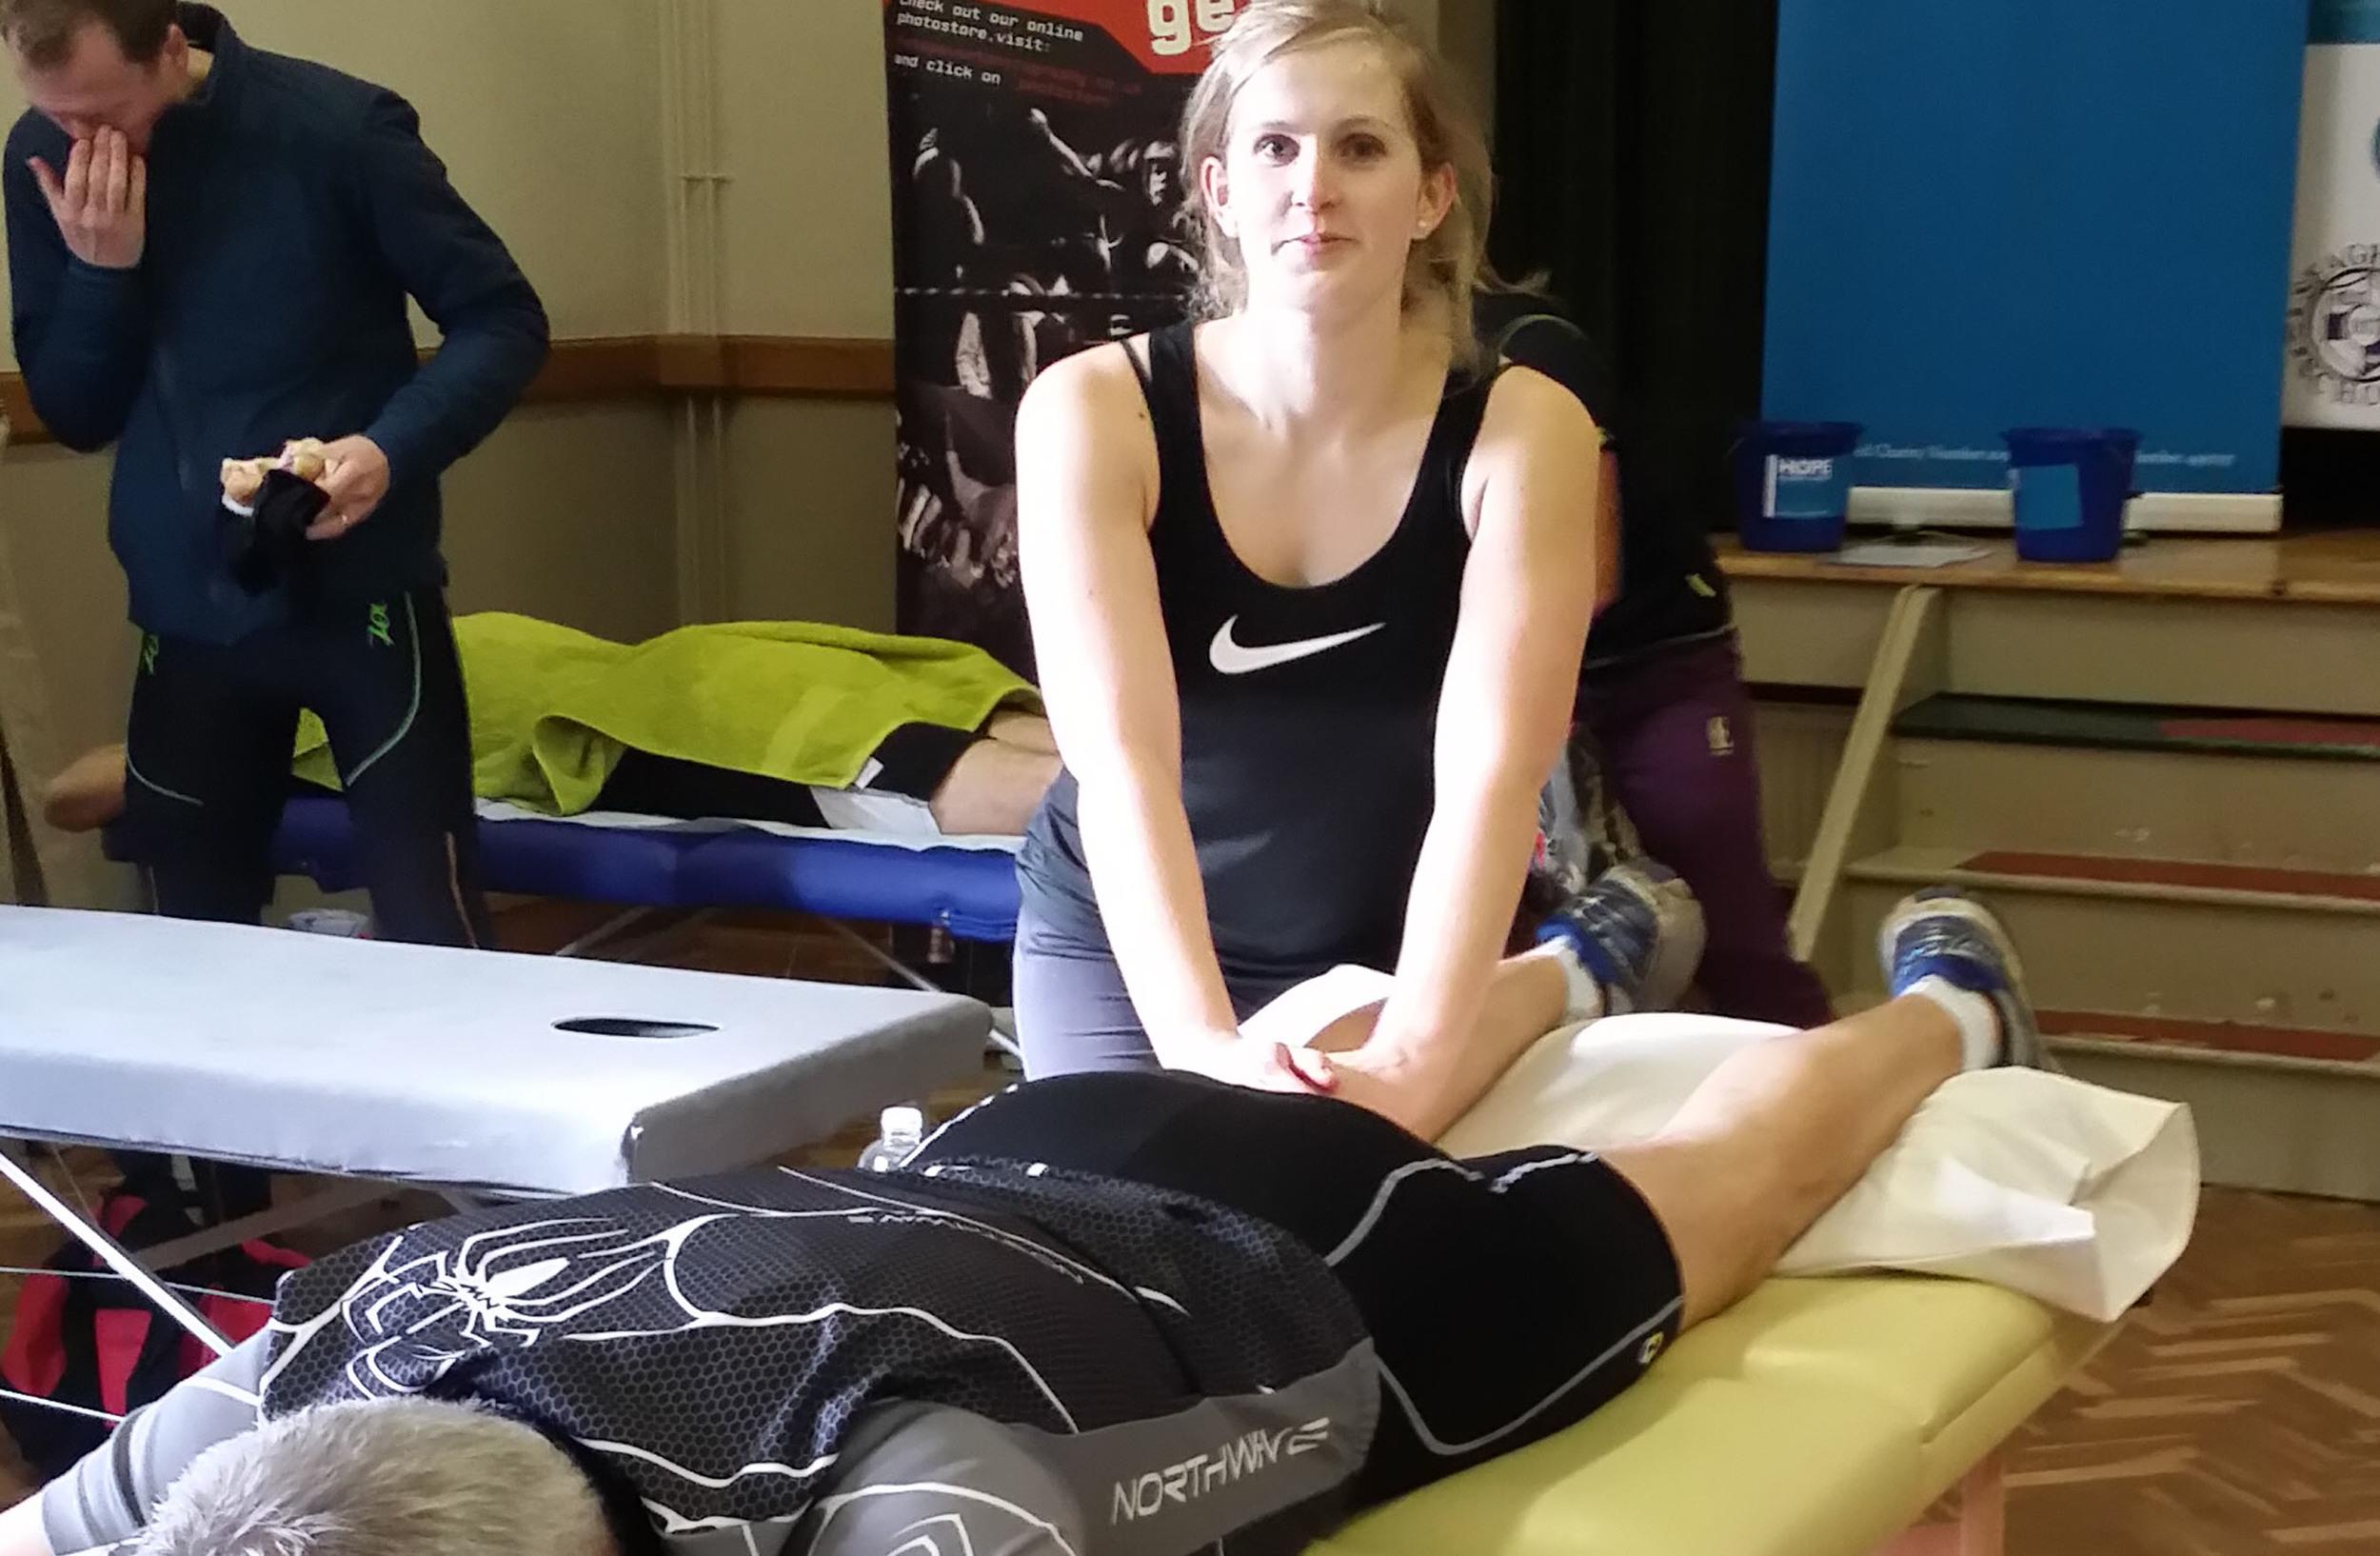 Joanne Paul - Sports massage therapist    Qualified in level 3sports massage therapy